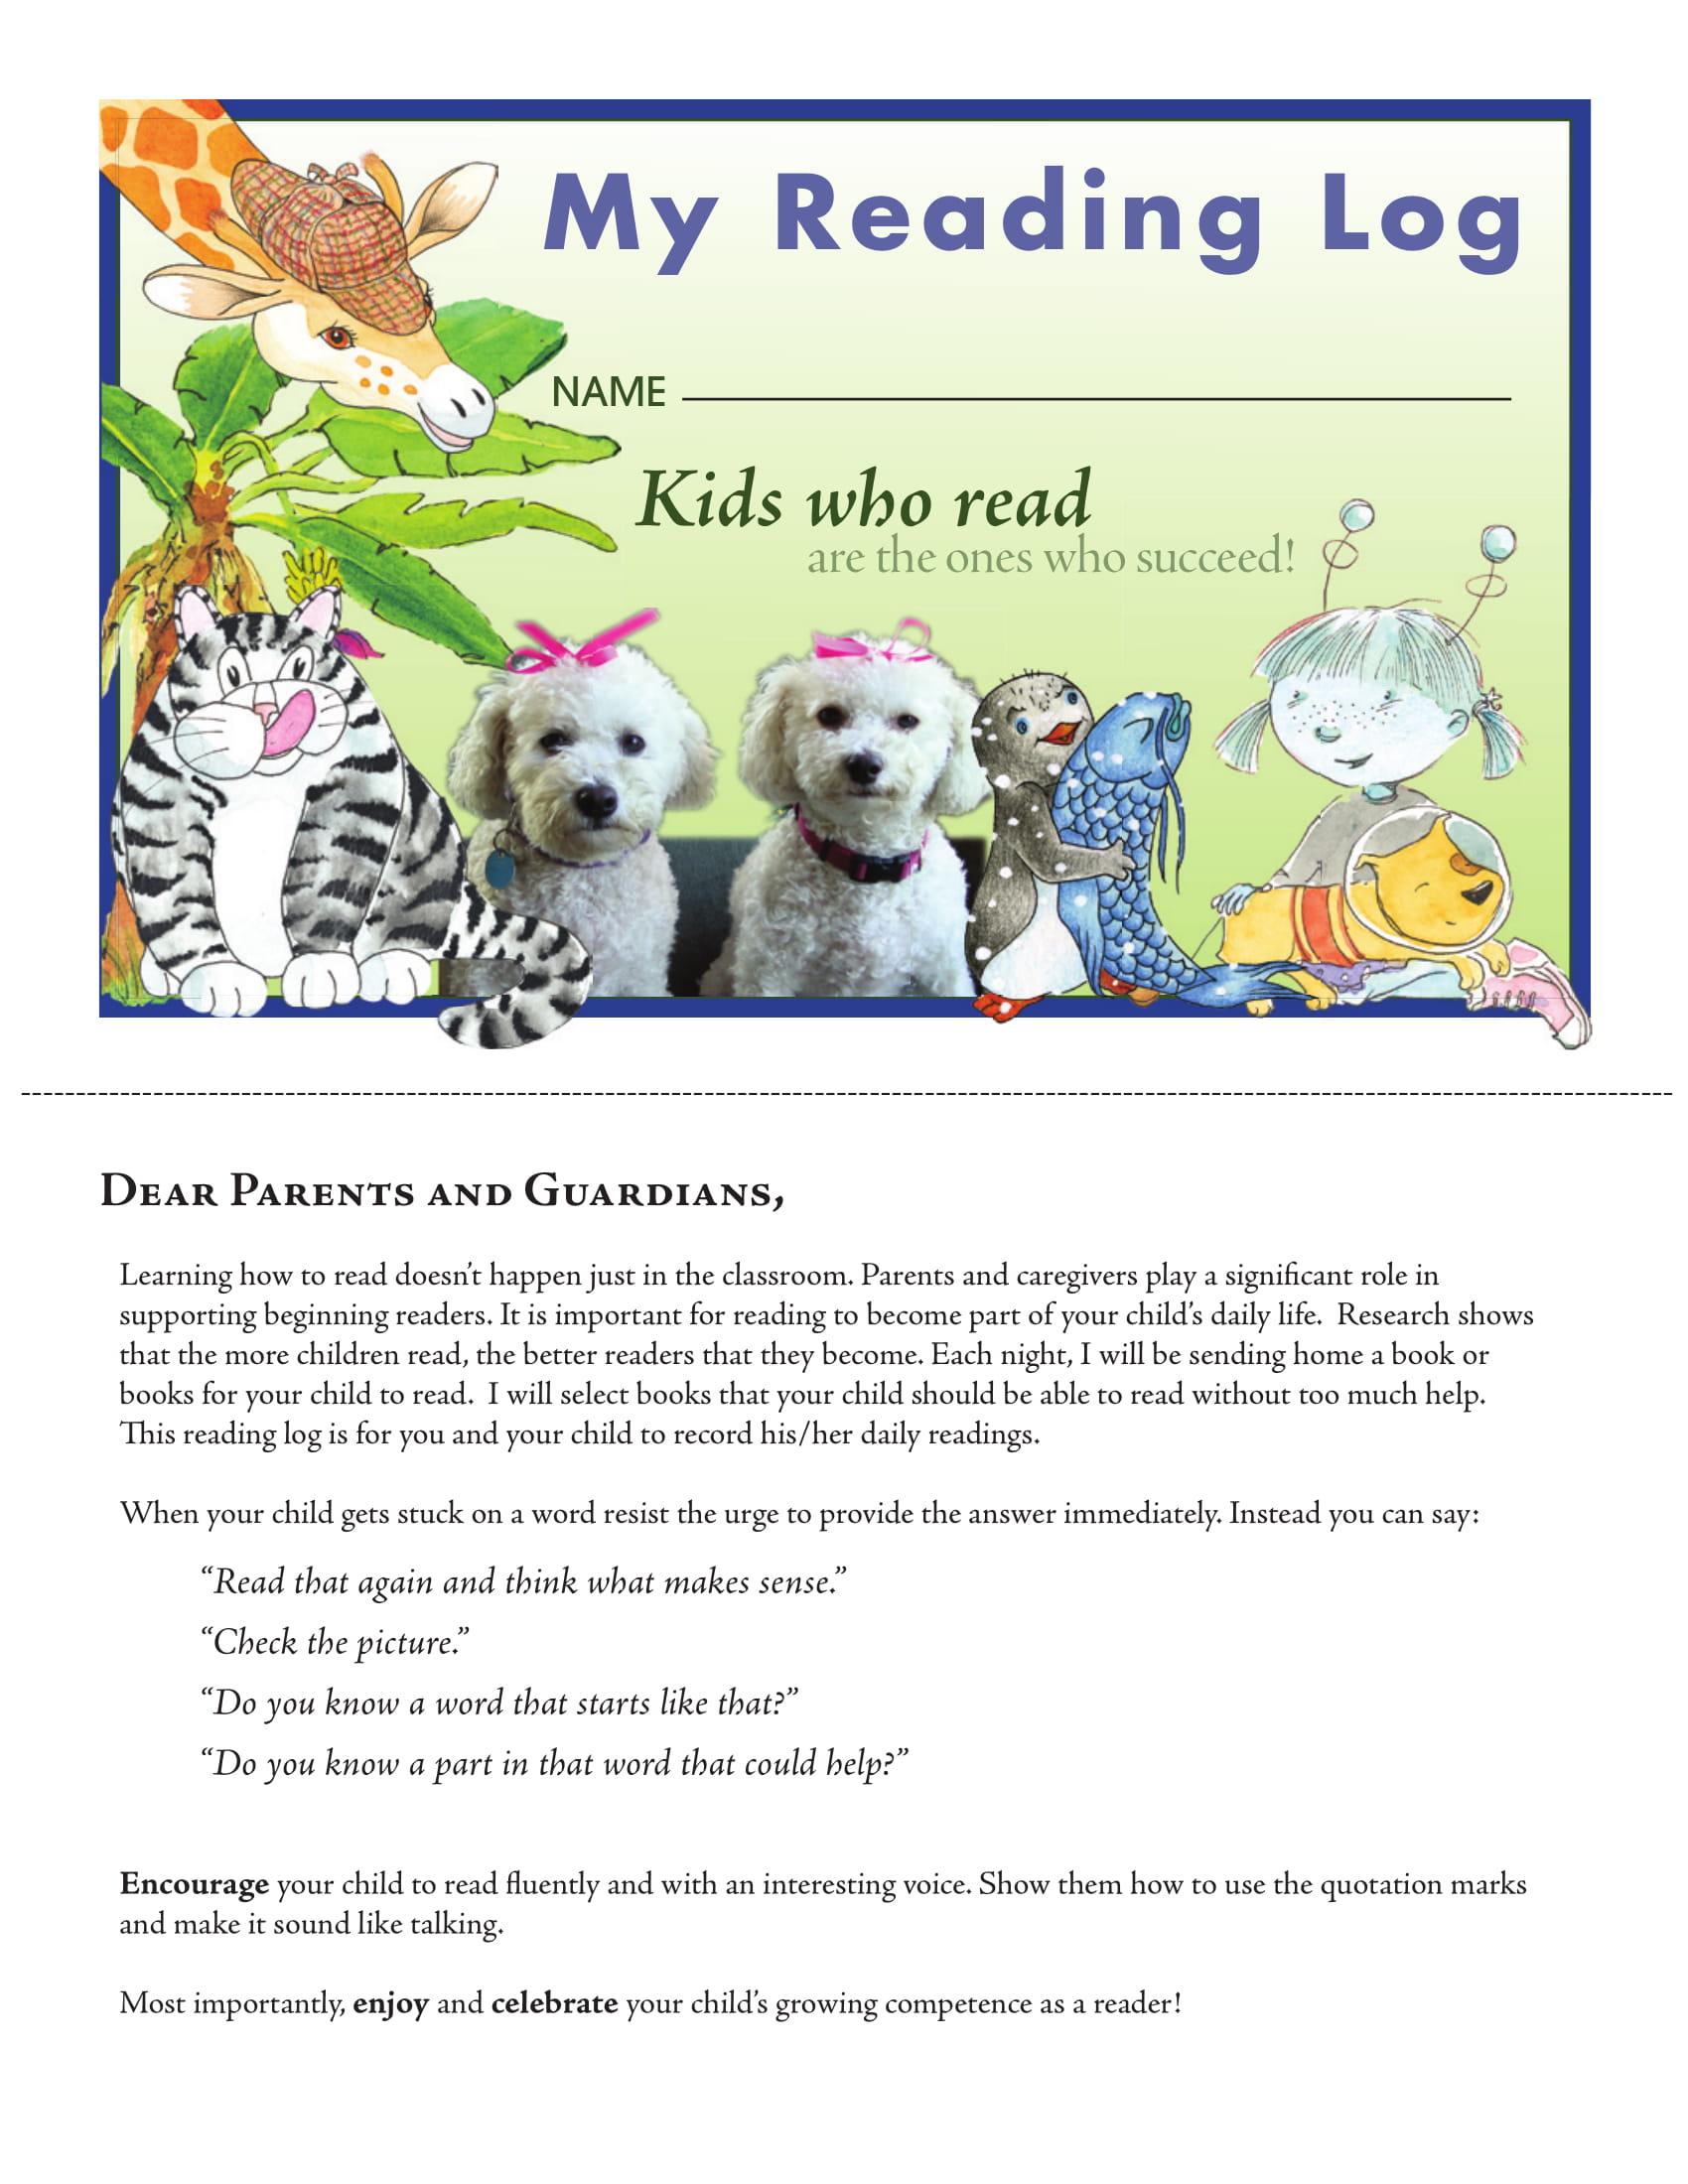 kids reading log example